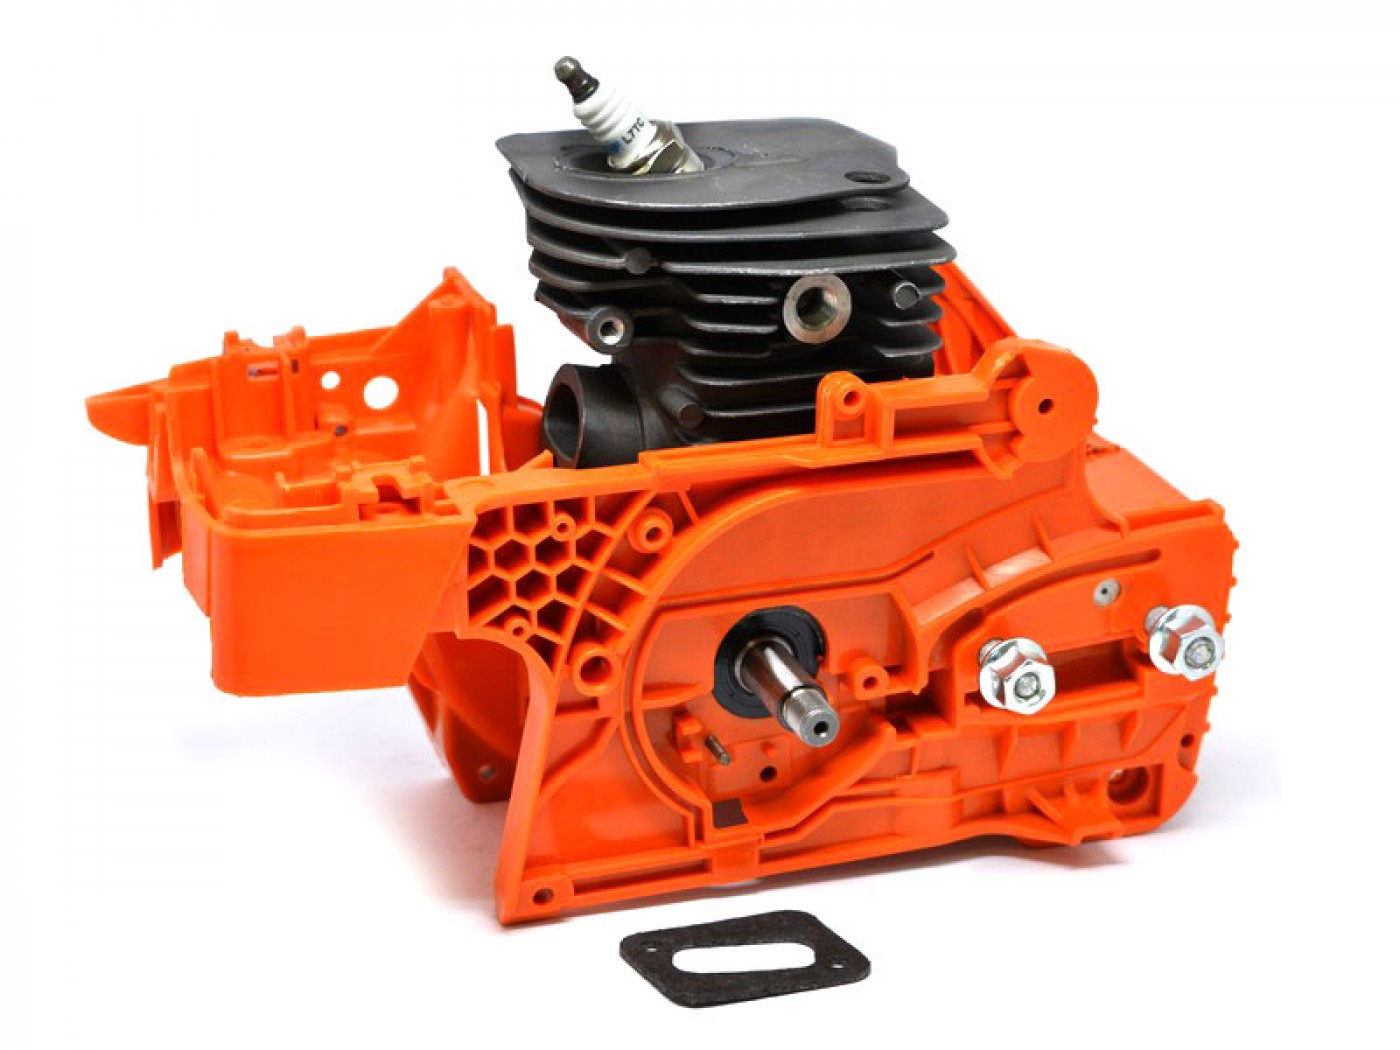 Polomotor Husqvarna 345 + kľuková skriňa